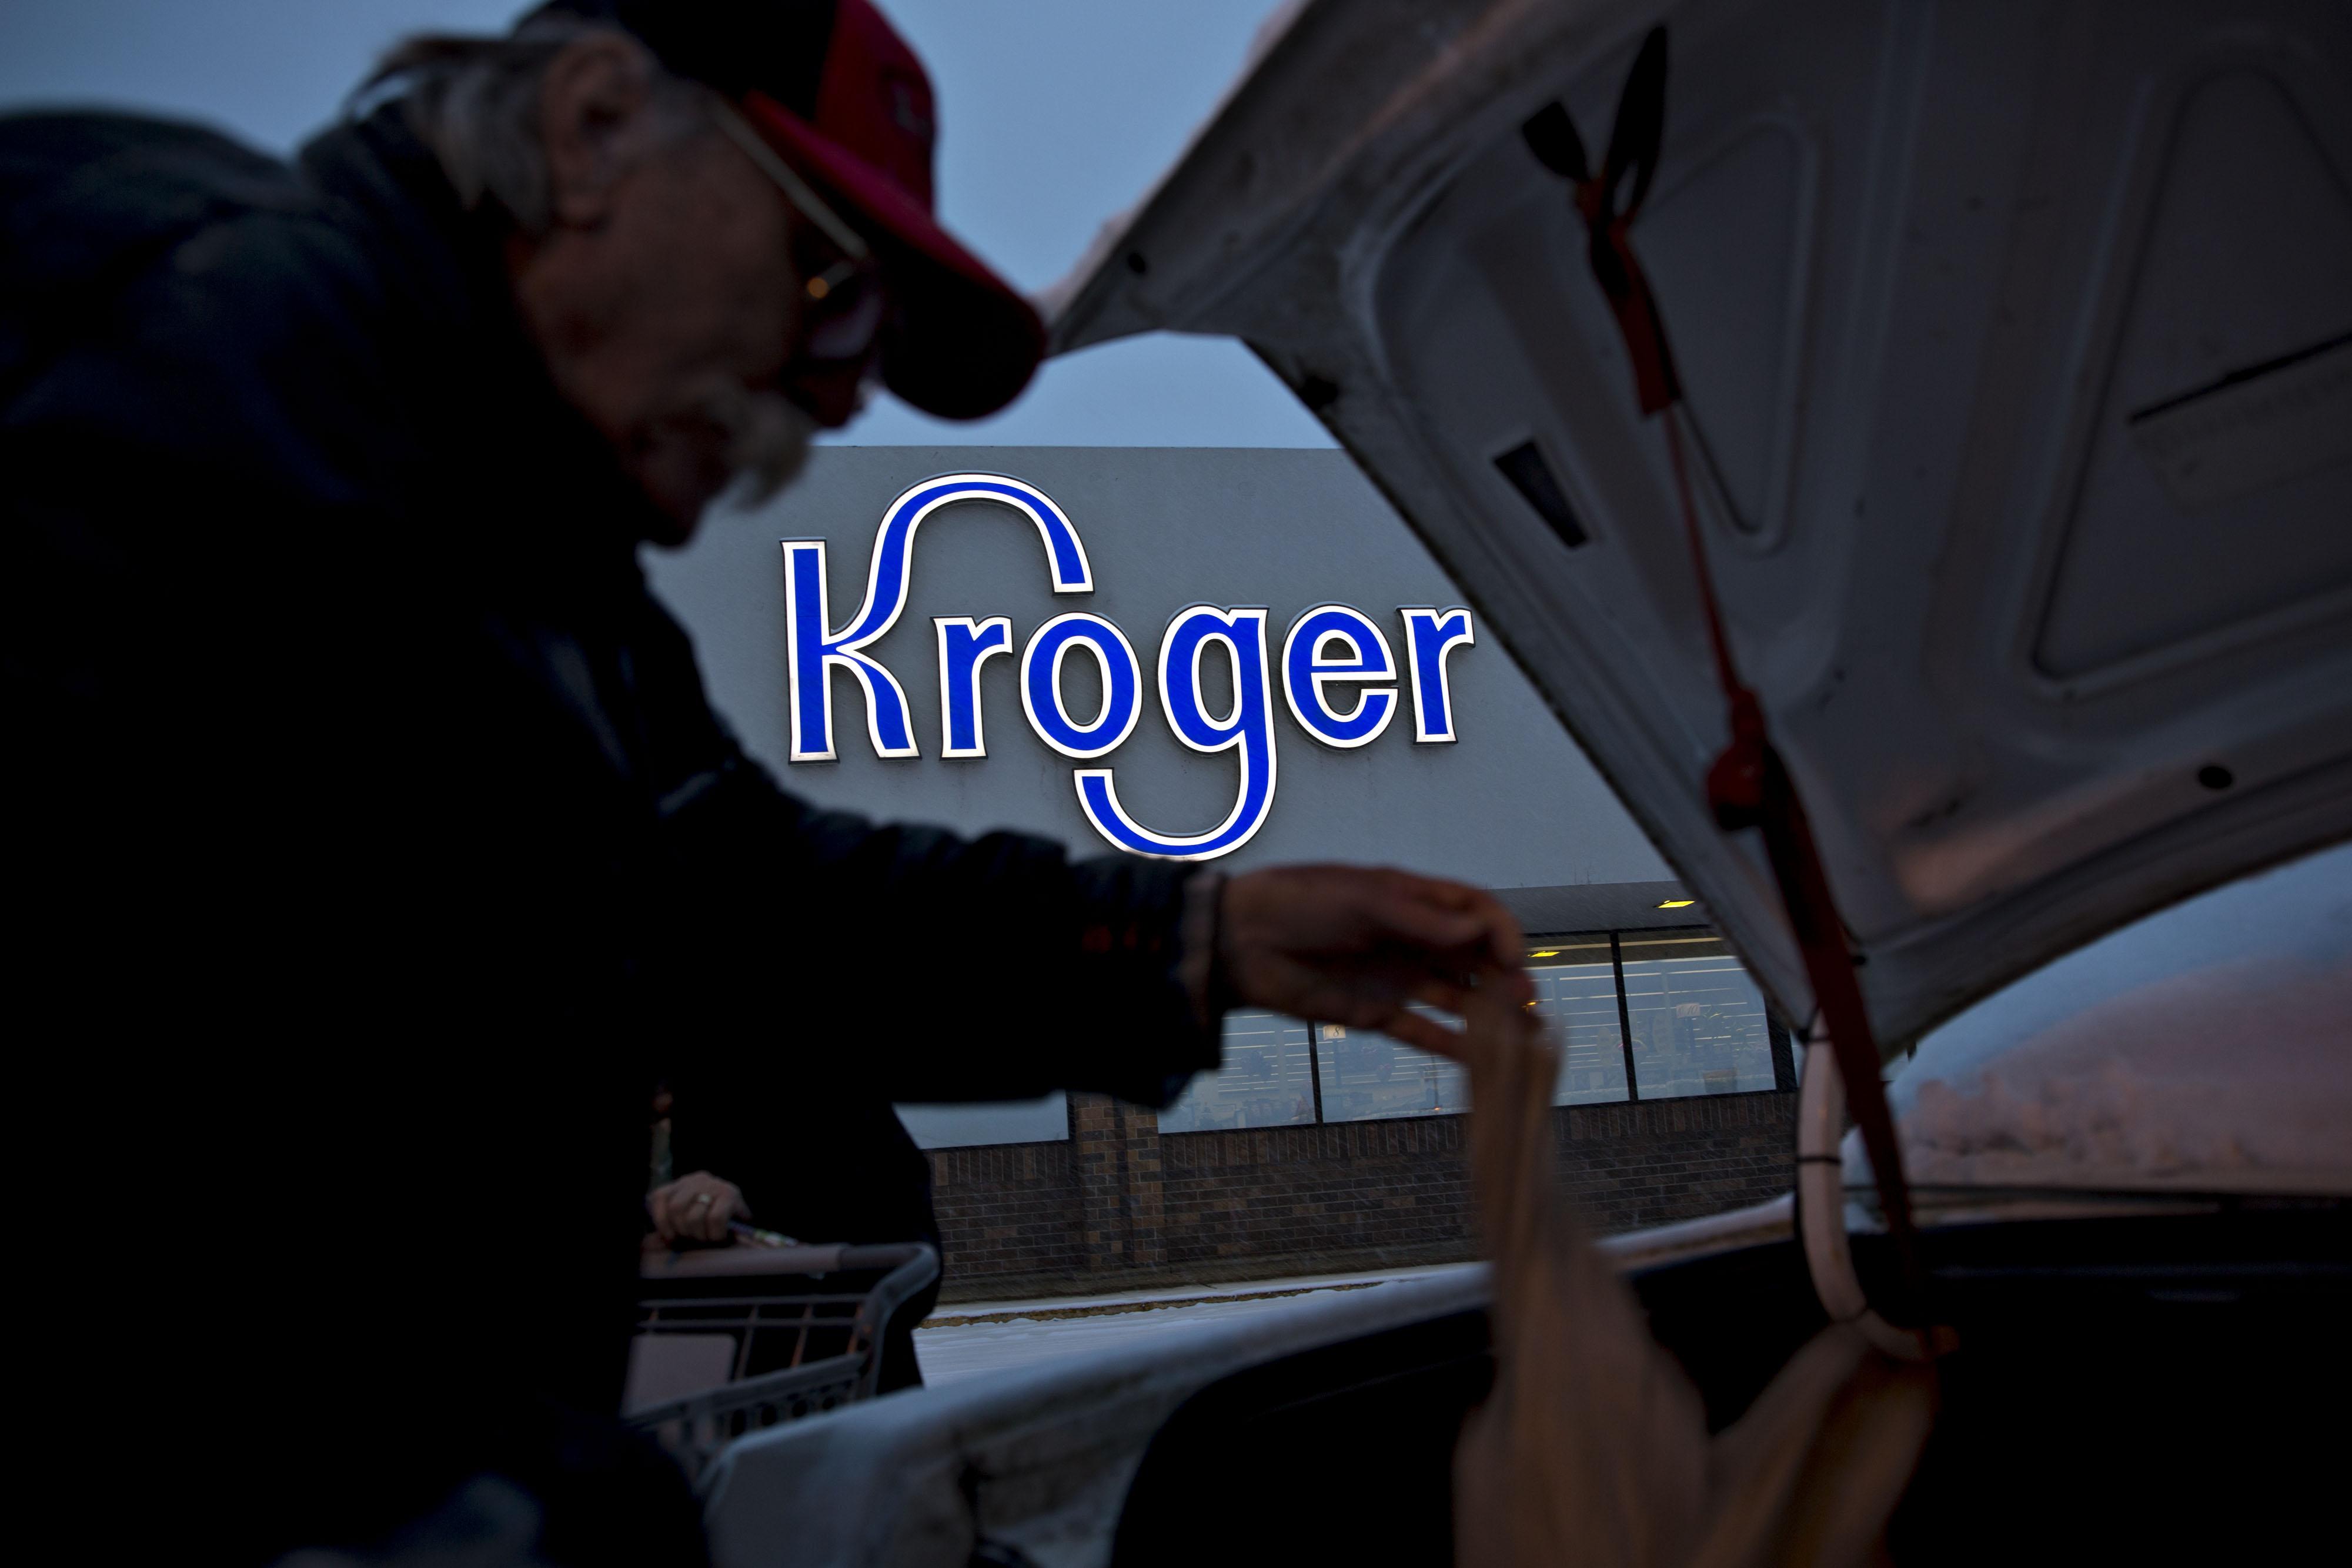 bloomberg.com - Sarah Halzack - Kroger Gets Schooled by Walmart and Target